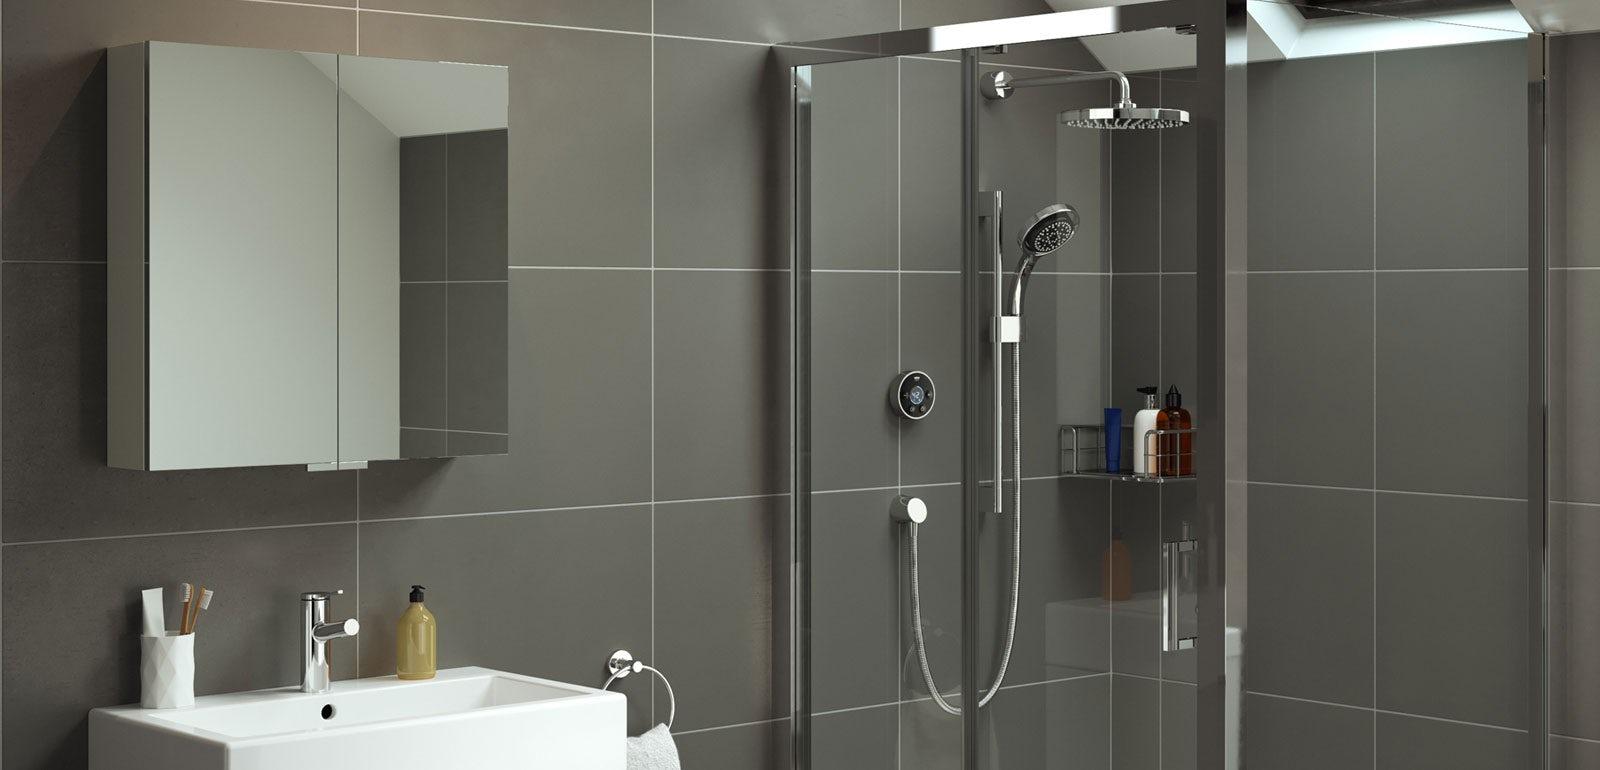 Expert Advice: Mirau0027s Digital Showers Buying Guide